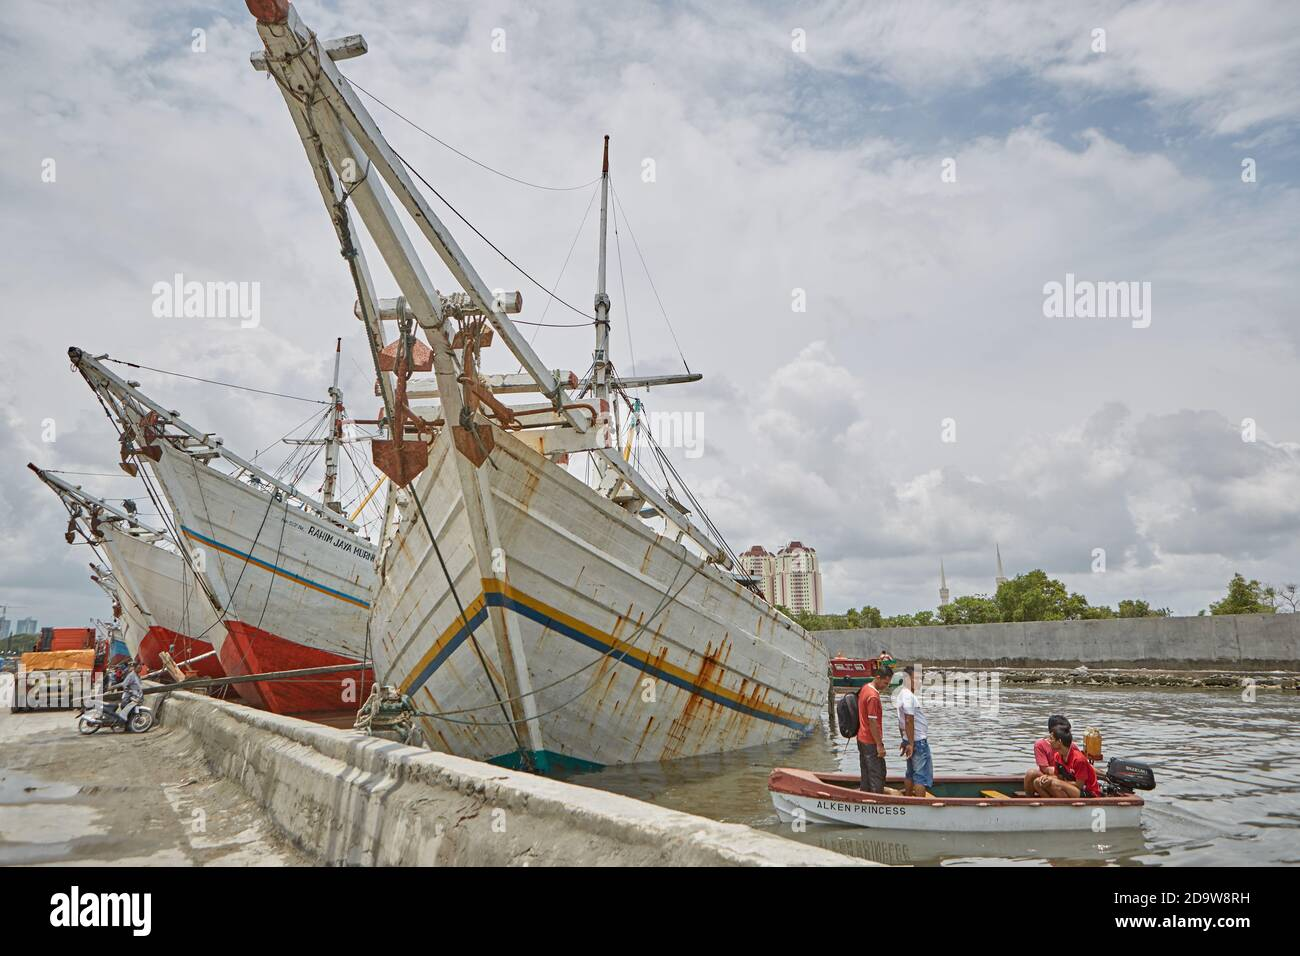 Pelabuhan Sunda Kelapa High Resolution Stock Photography And Images Alamy